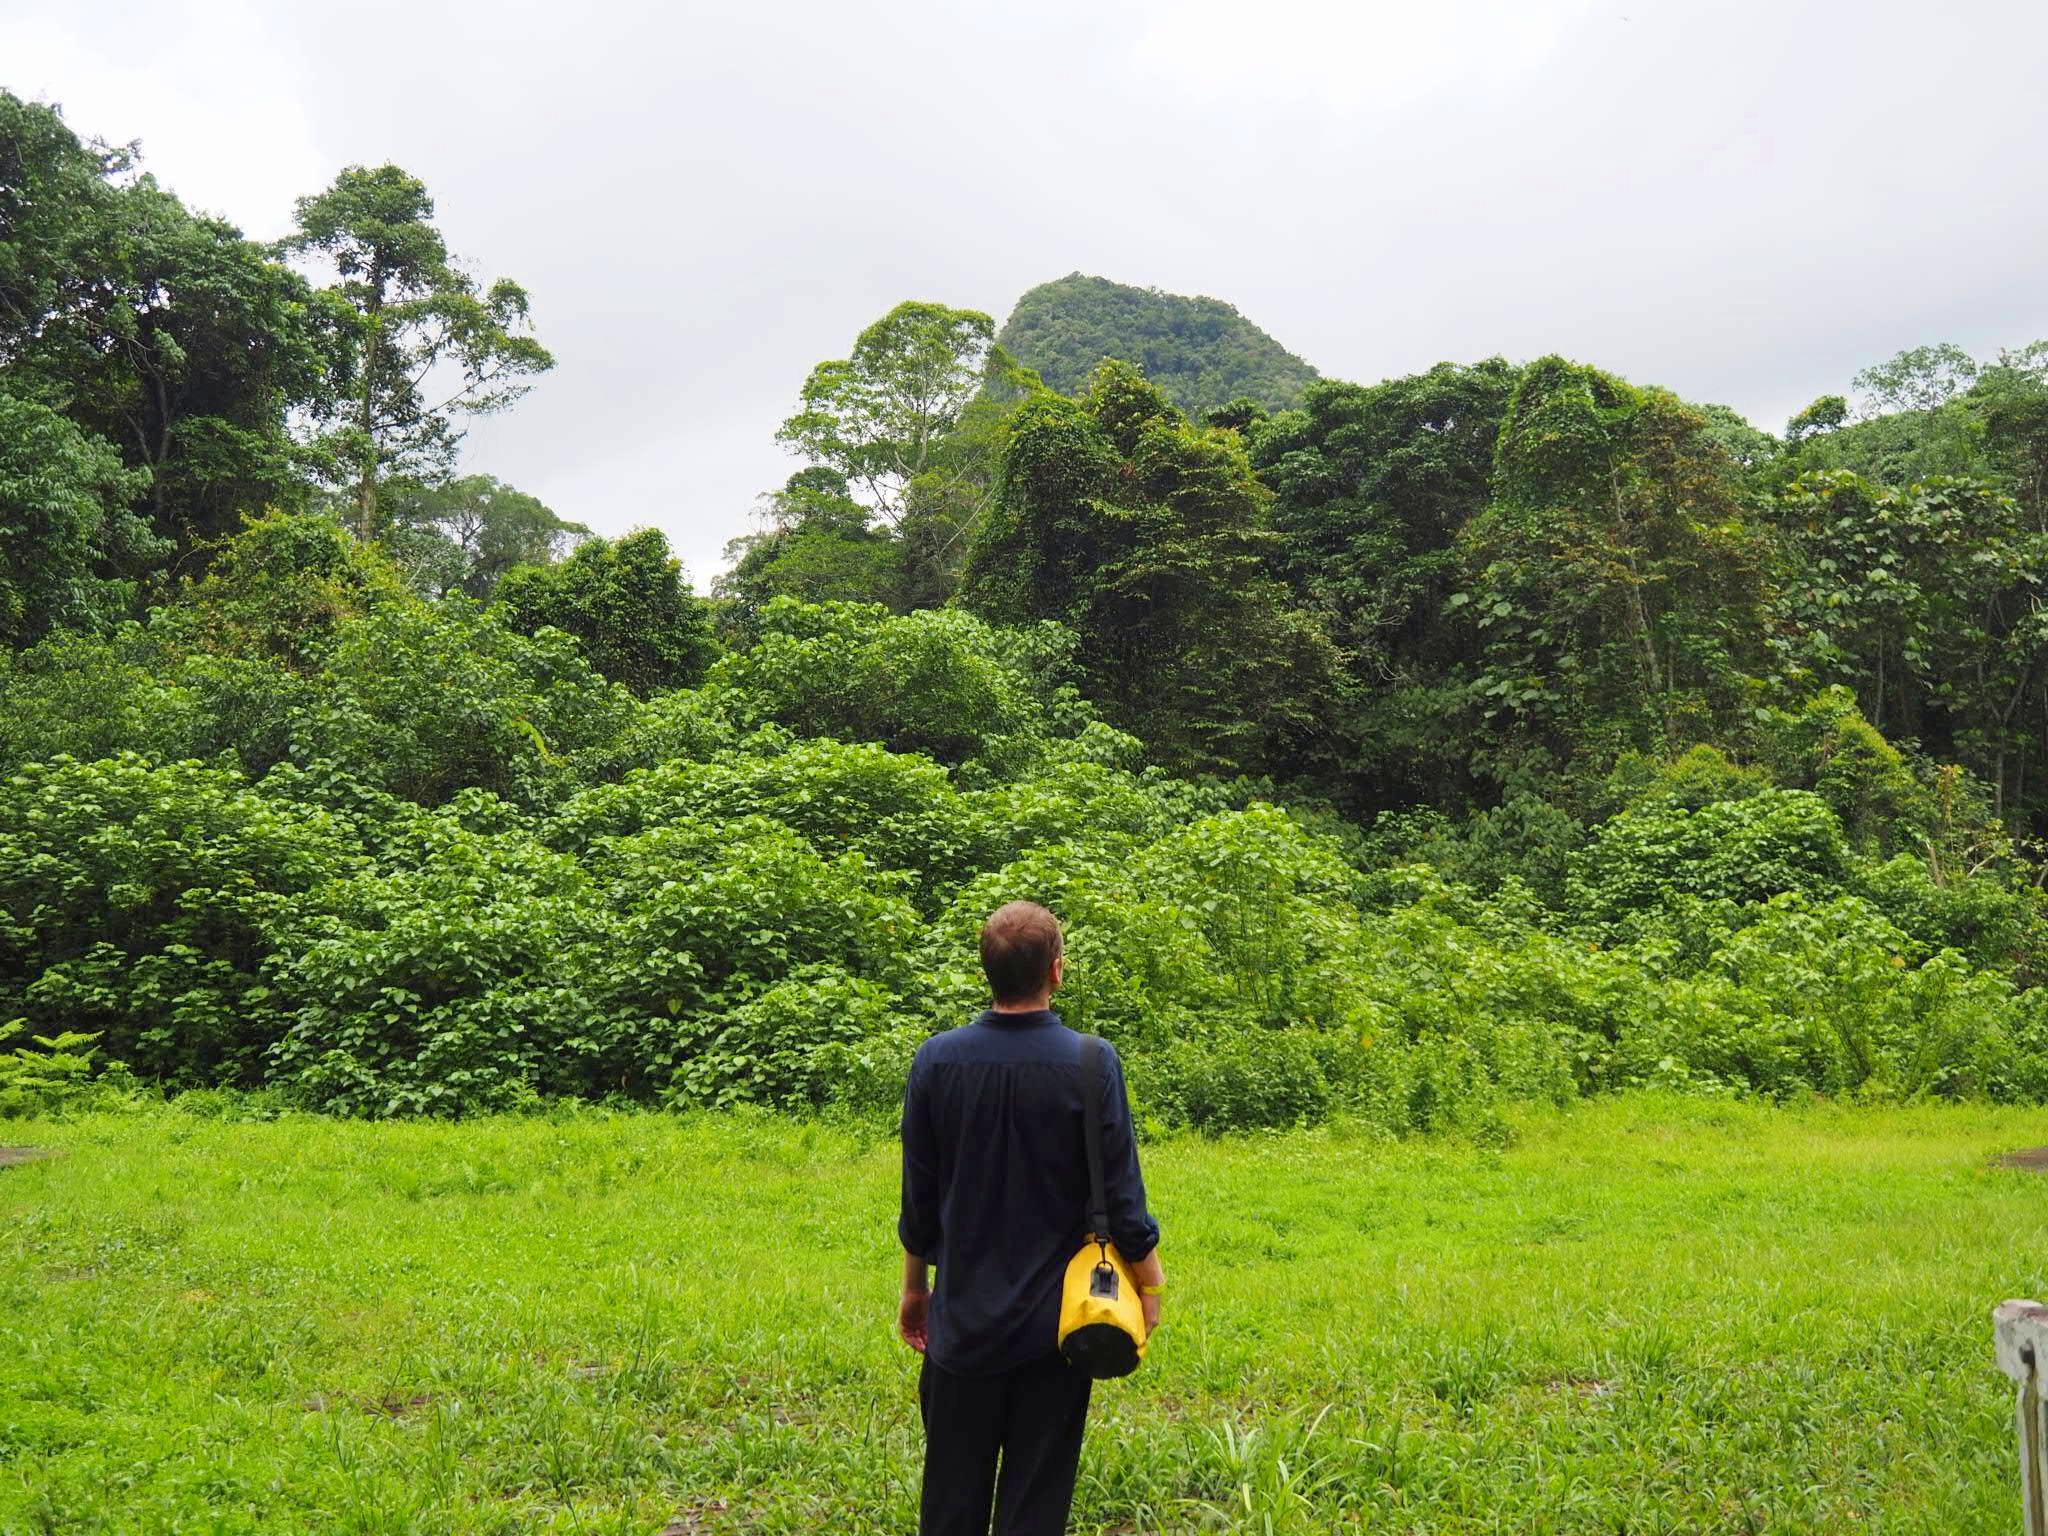 Vincent at Mulu 2 Mulu National Park Sarawak Malaysia.jpg